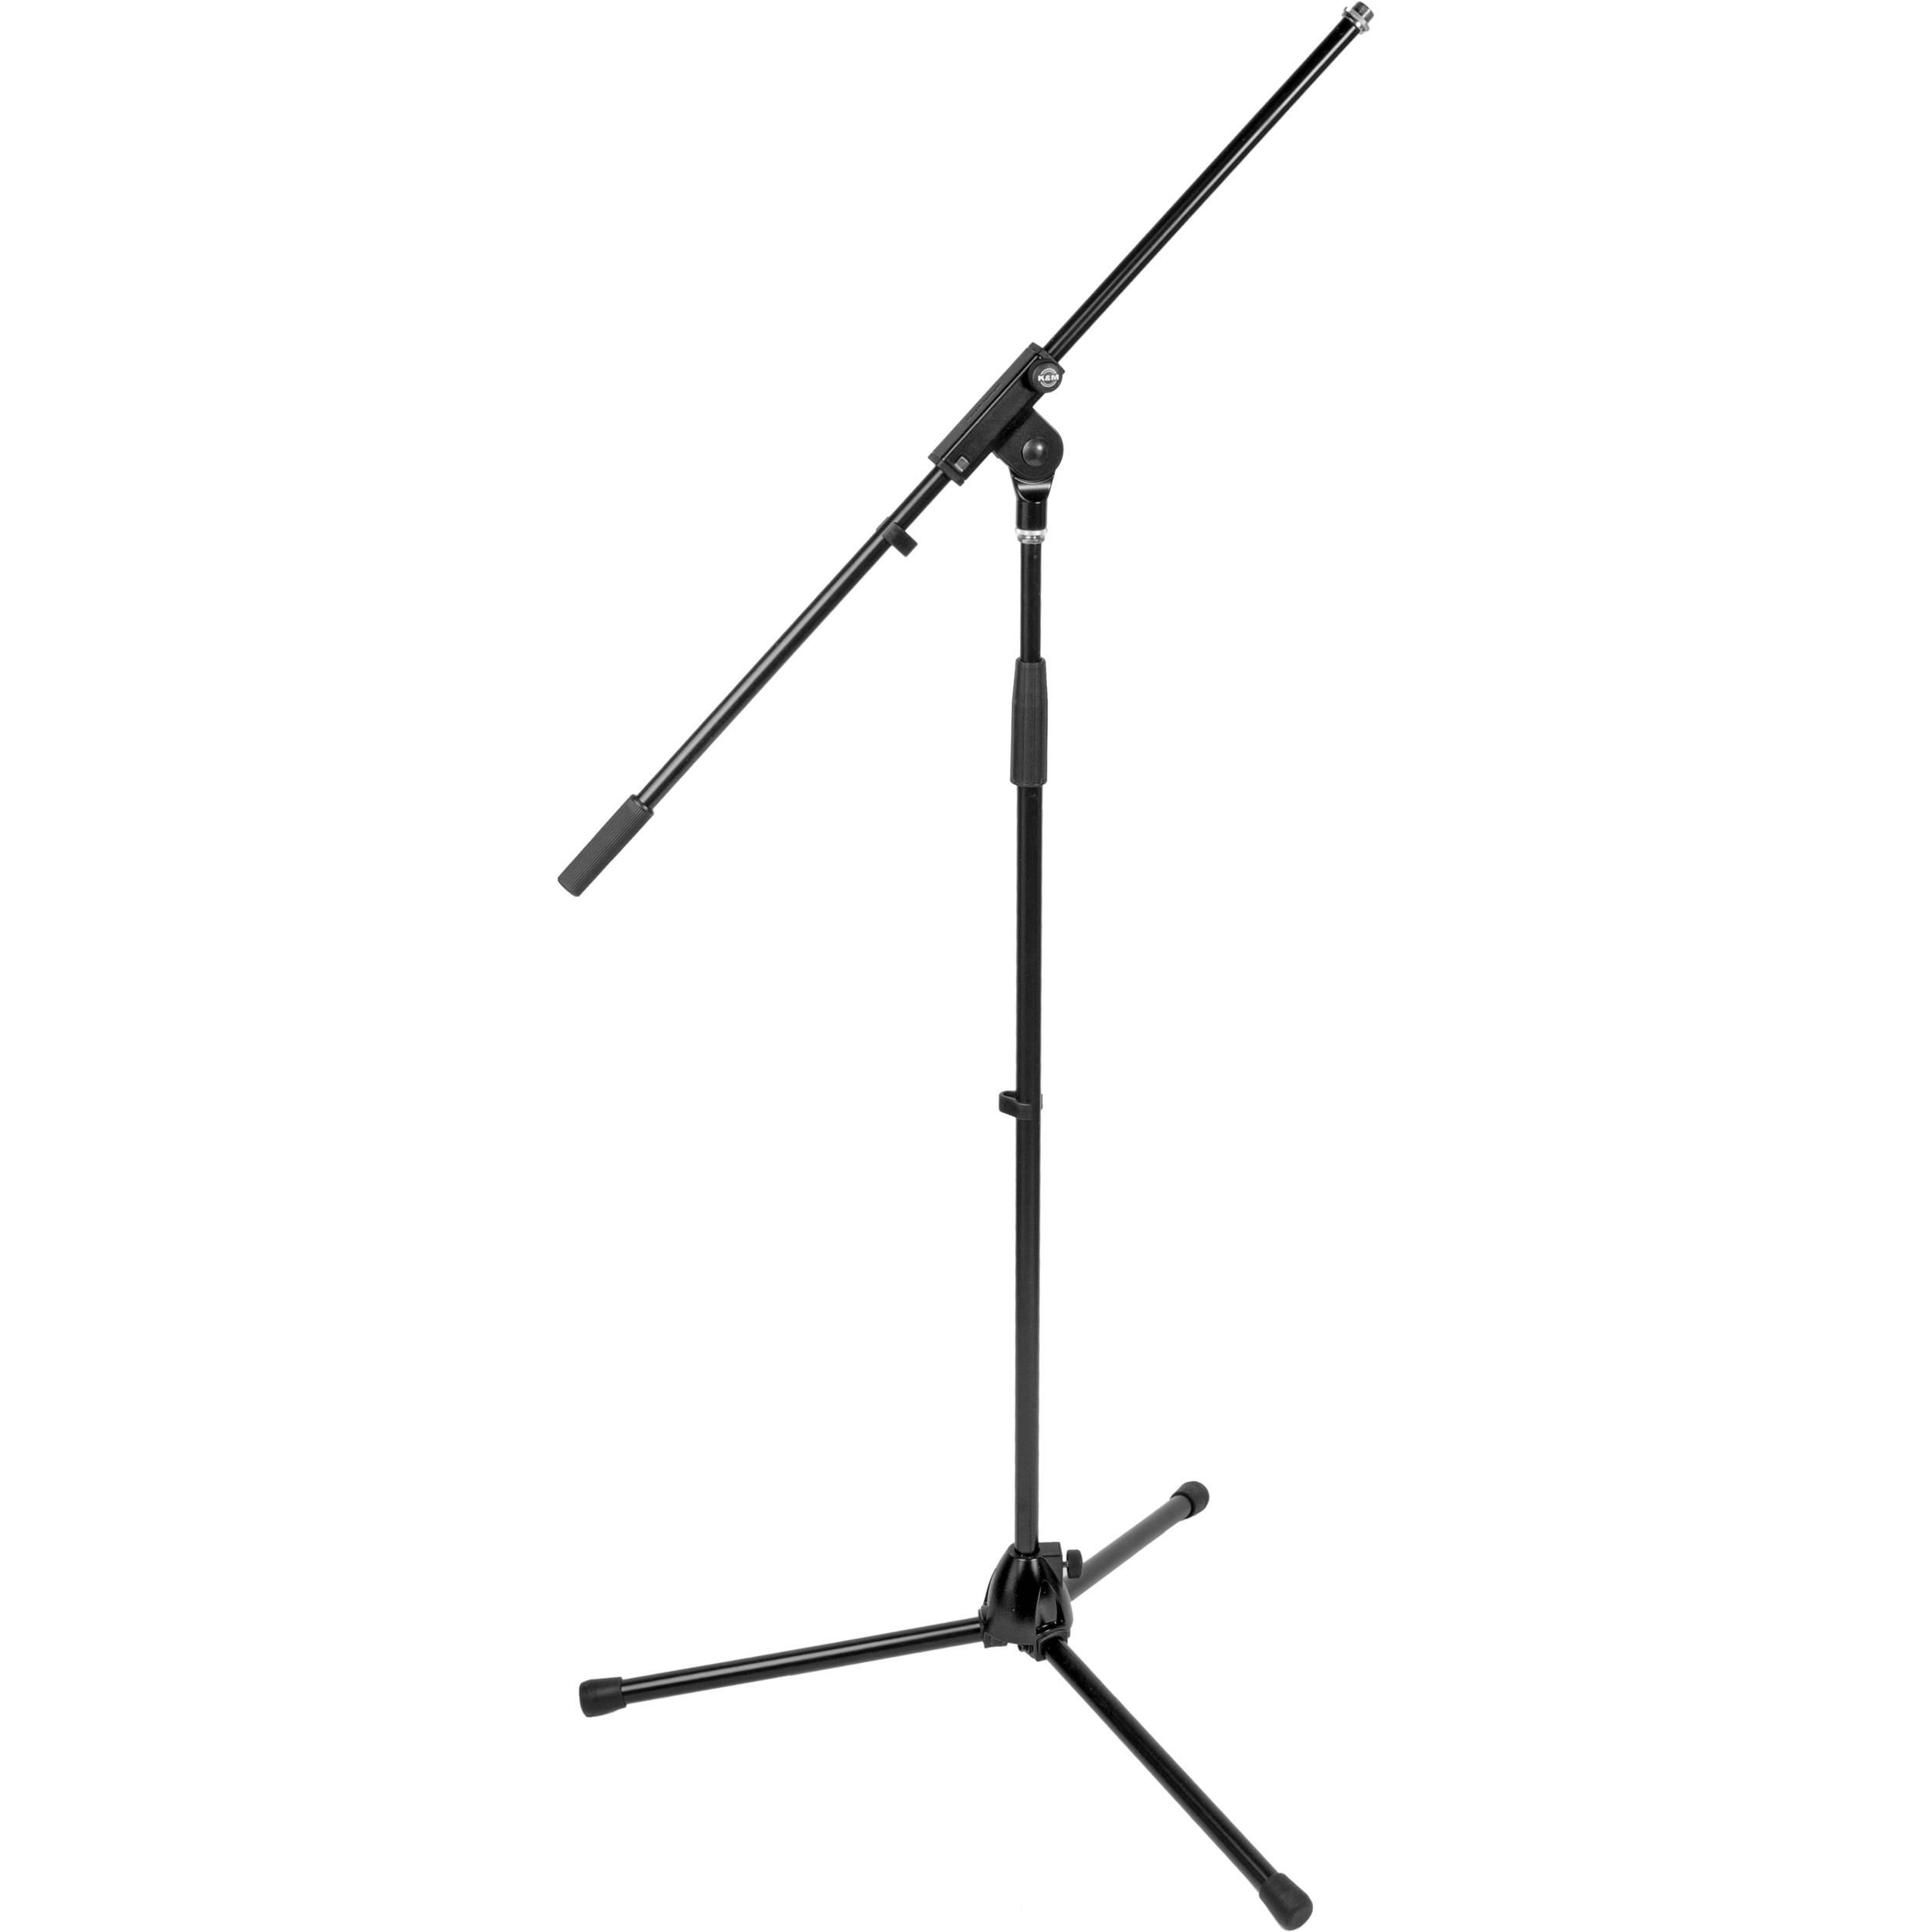 2500x2500 Kampm 21070 Tripod Microphone Stand With 32 21070 500 55 Bamph